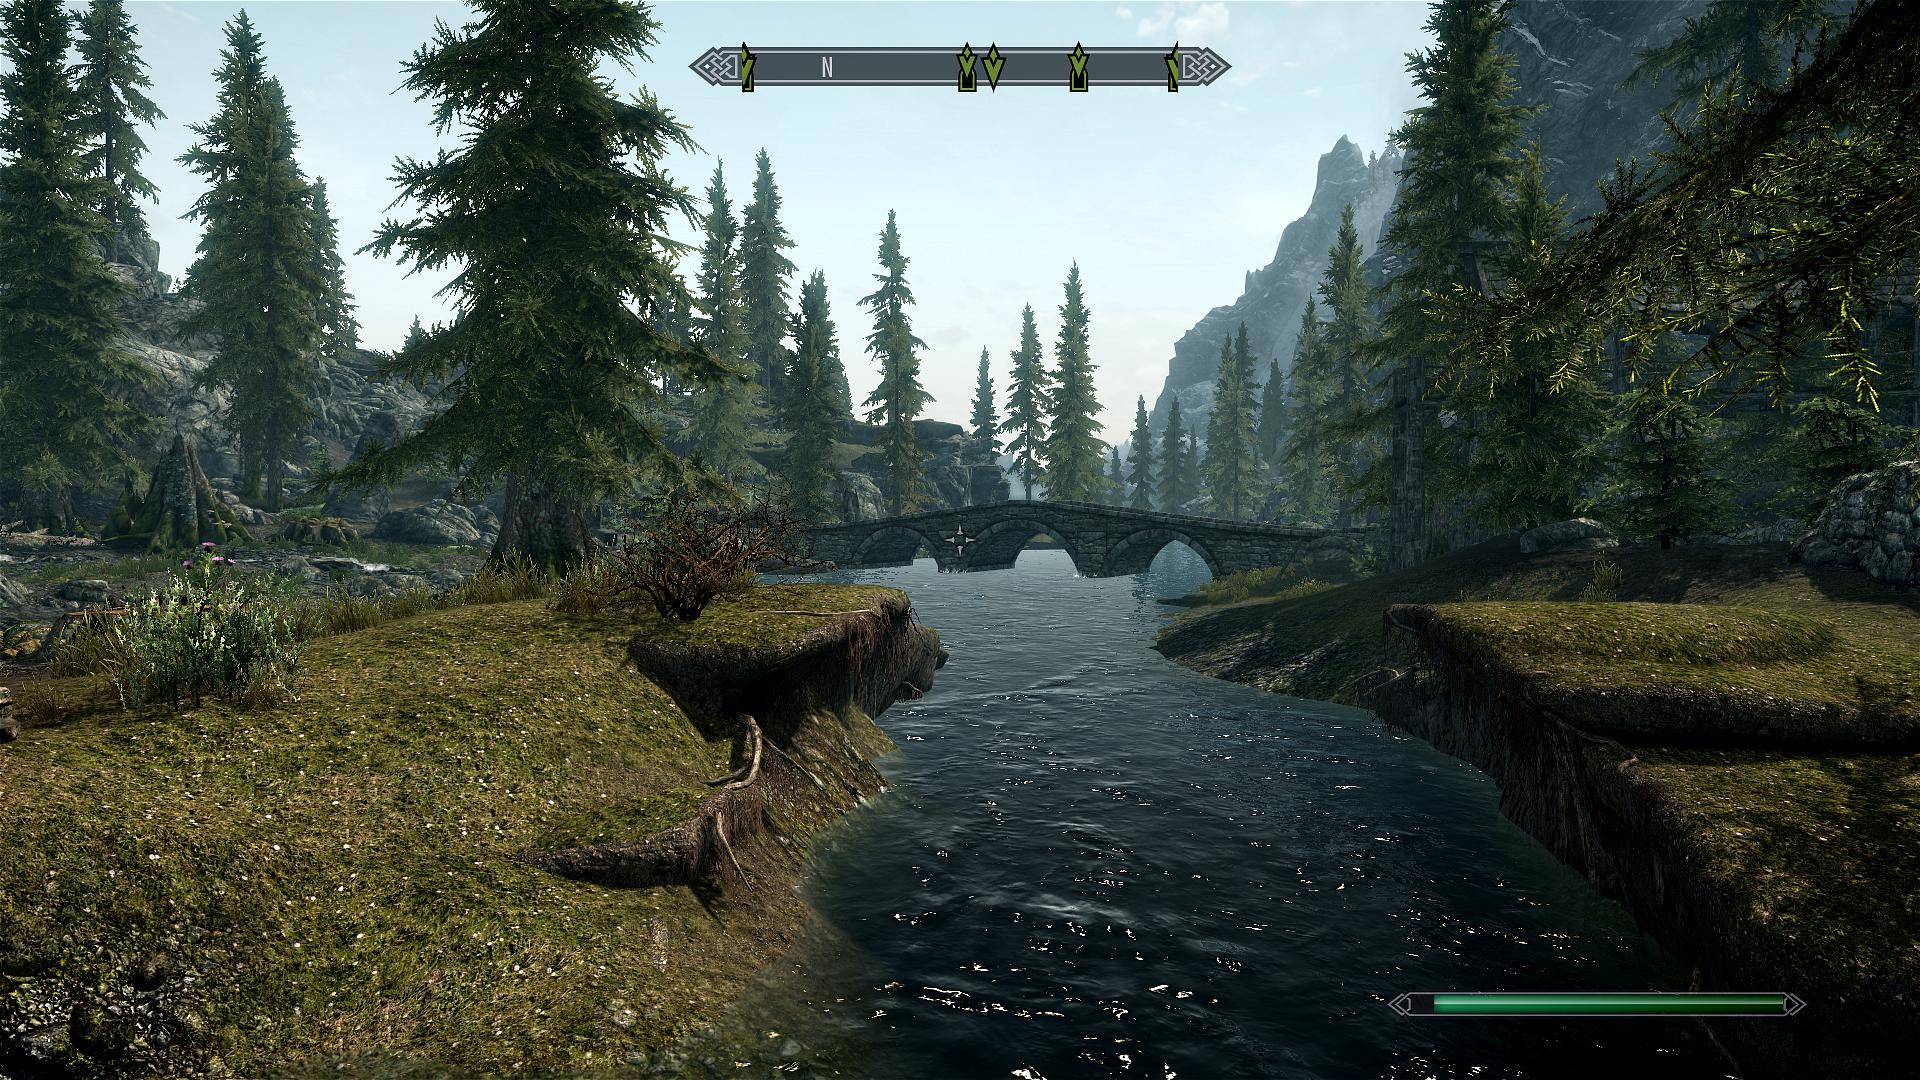 Screenshot3252.png